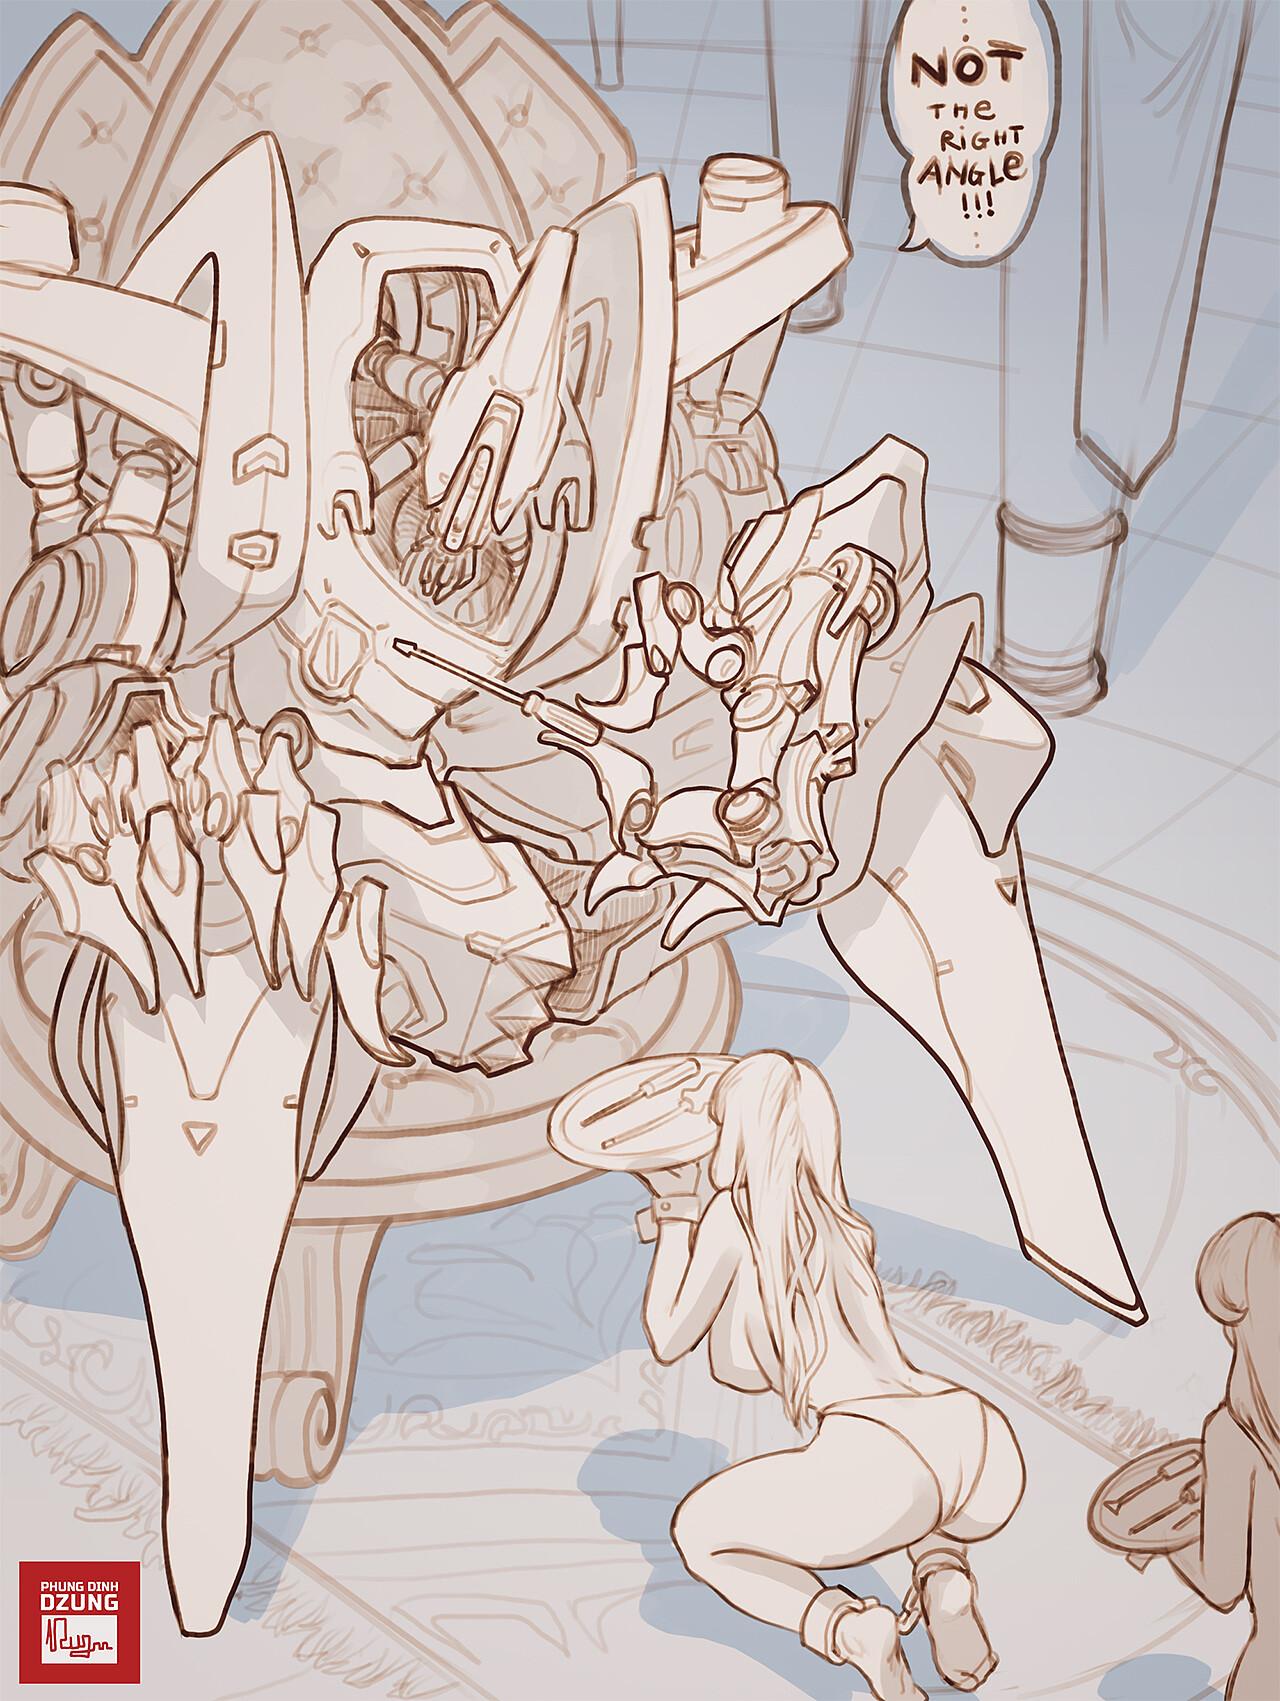 Dzung phung dinh 16 angulat